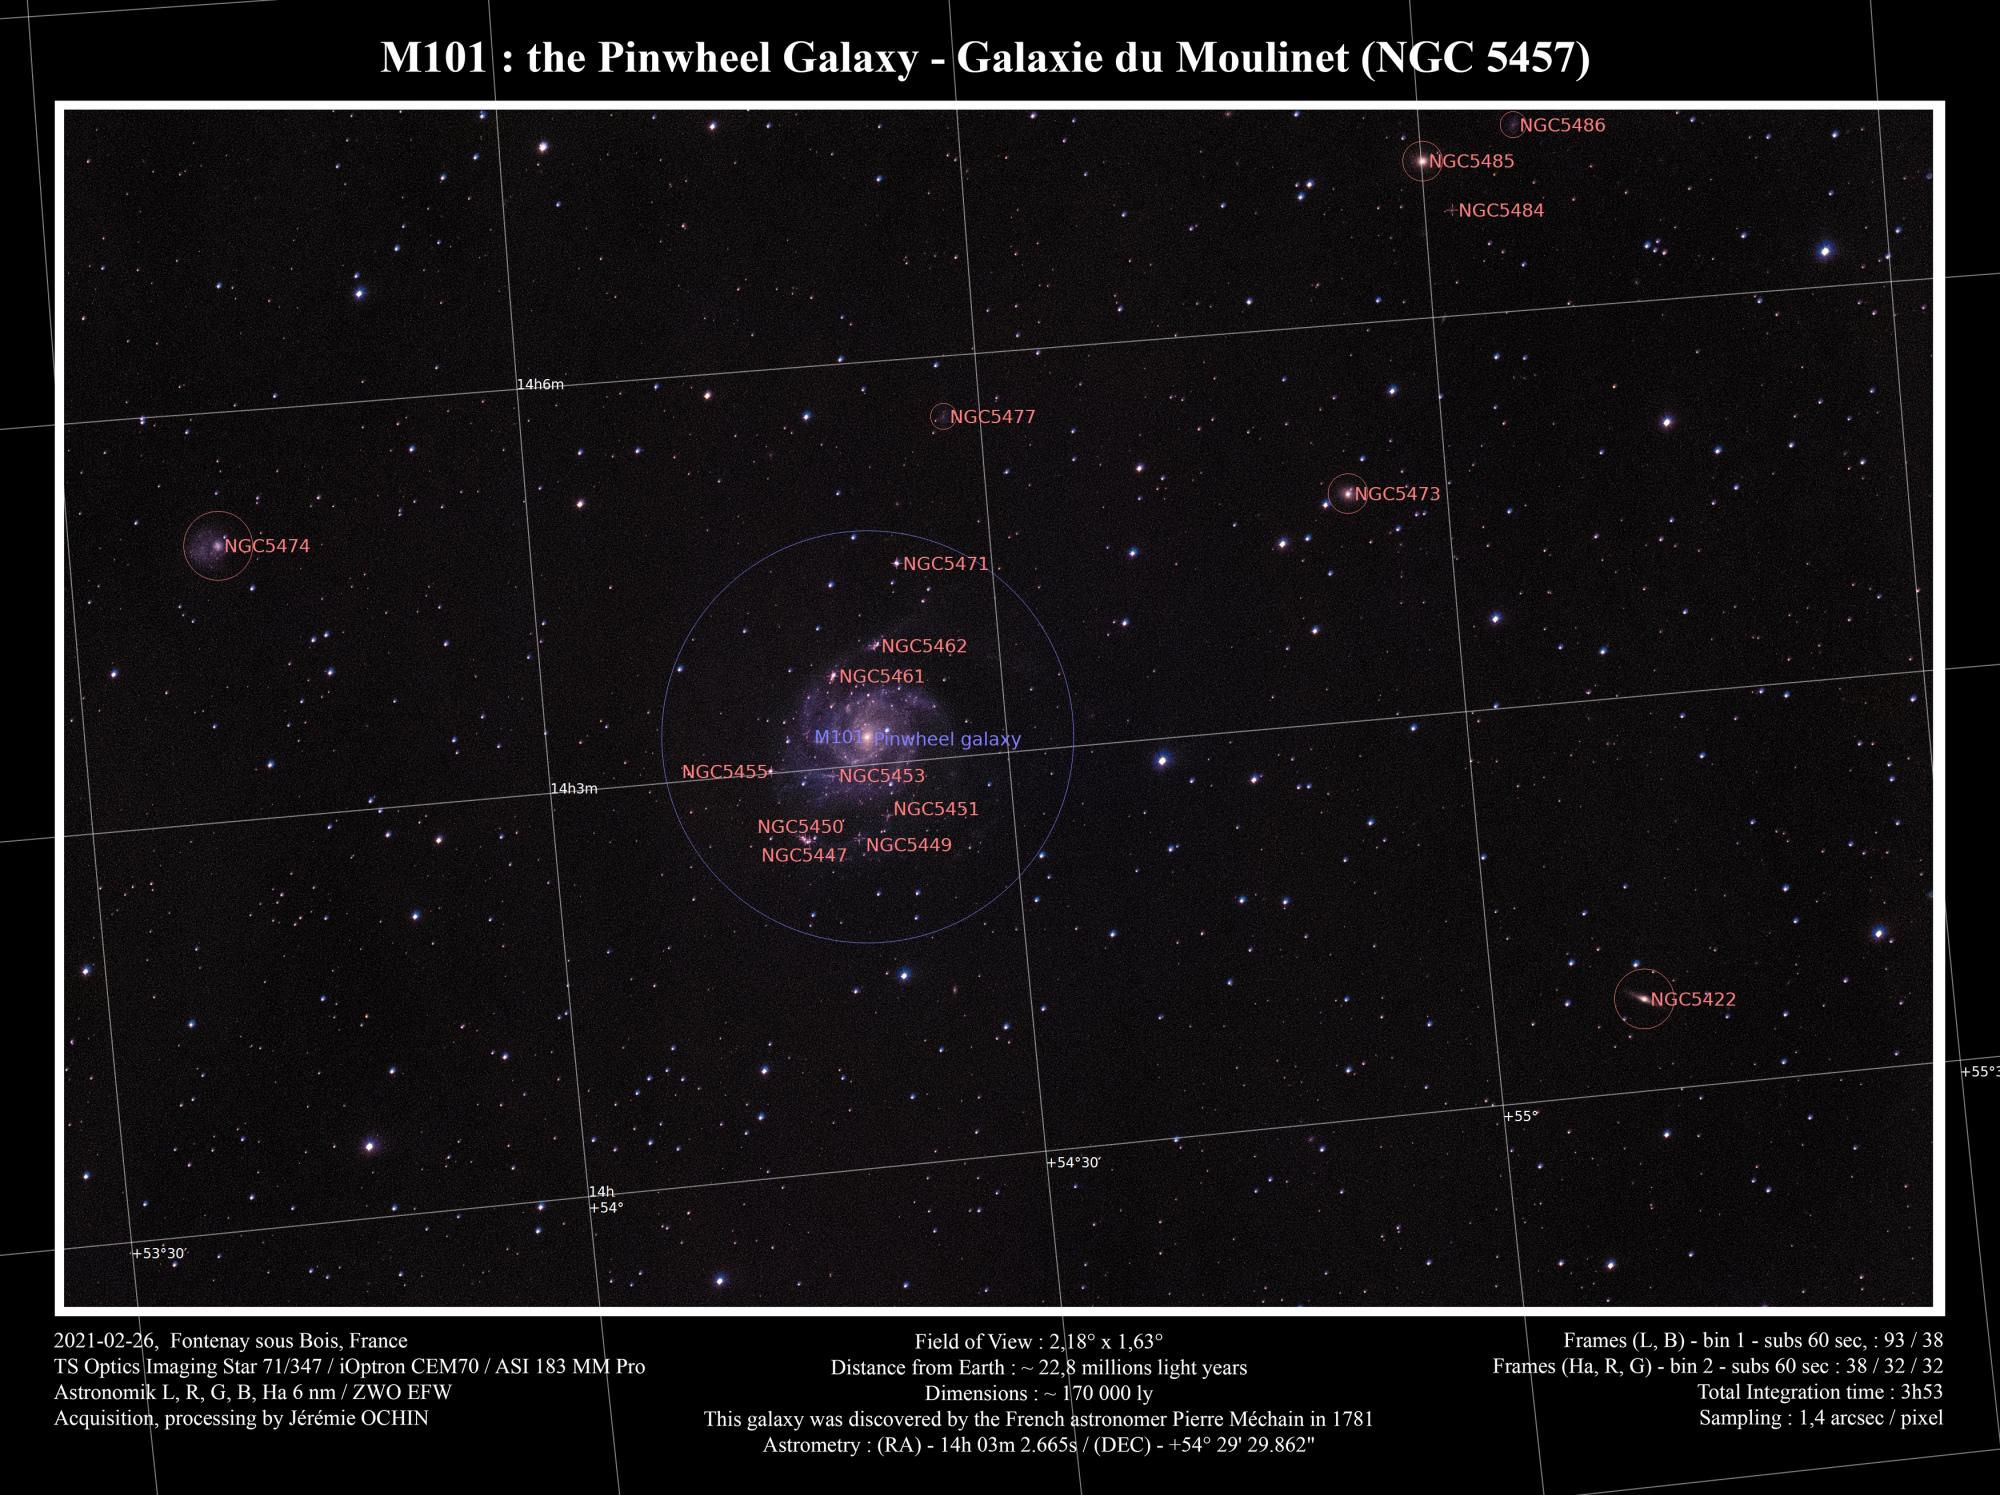 M101_smallRez_Annotated.jpg